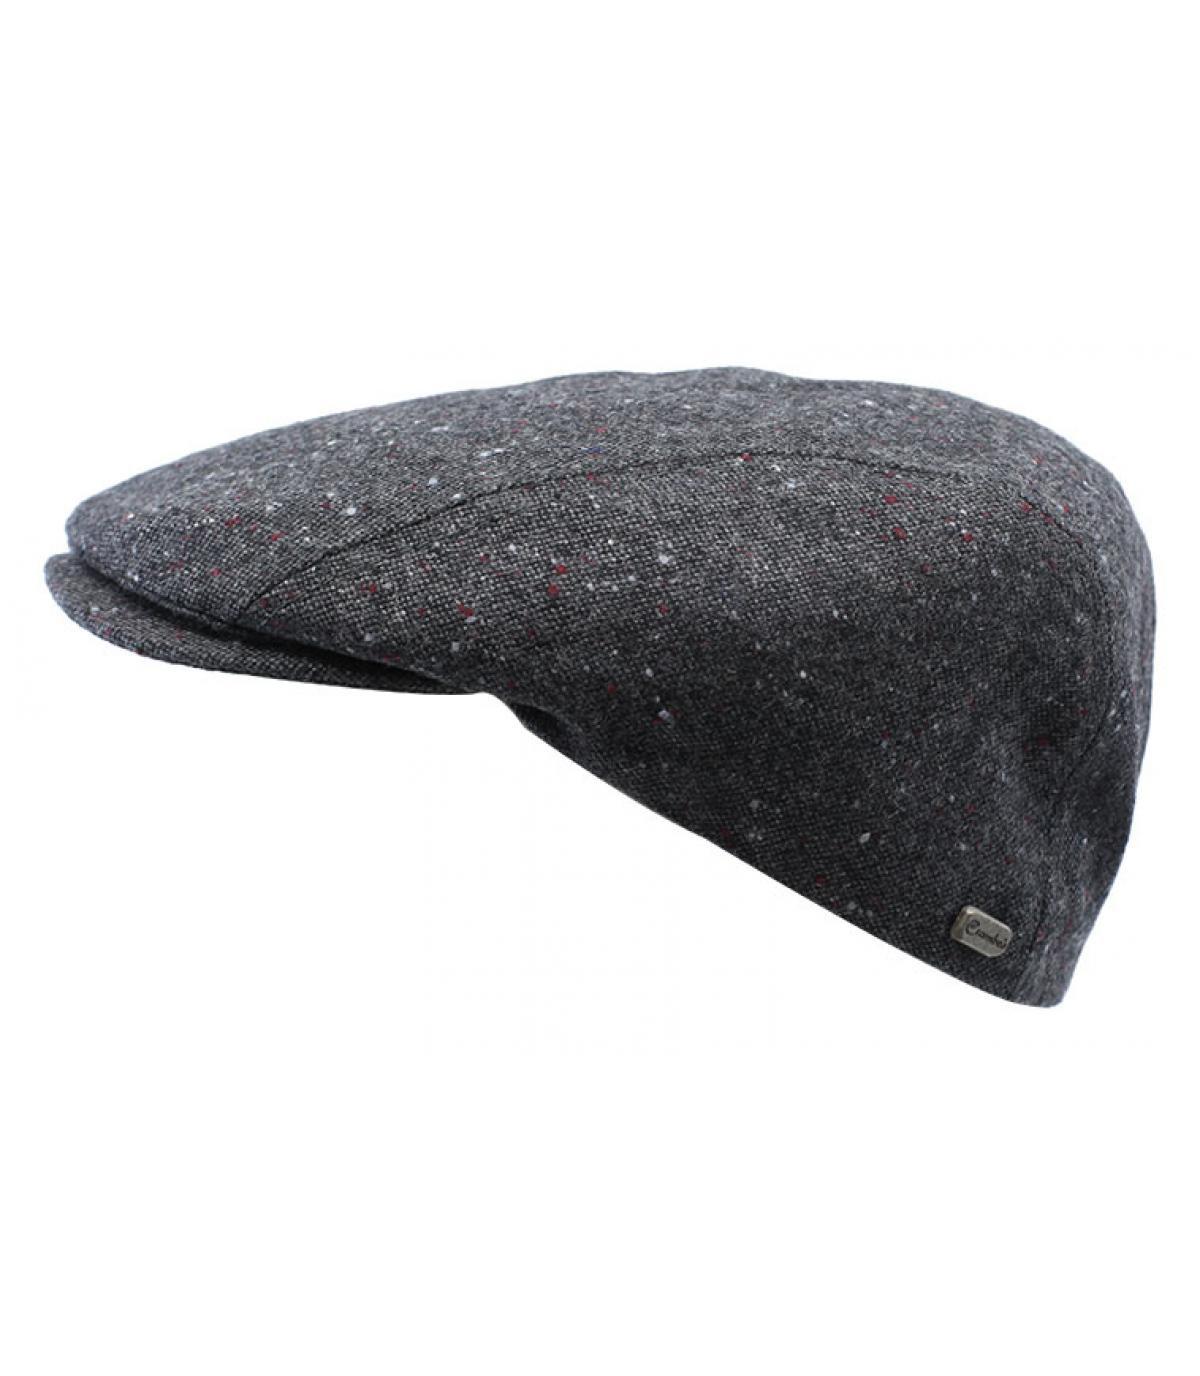 ... heather grey beret - Daffy Glenfi charcoal on your headwear shop  Headict - image 2 ... 489fb2faaa3